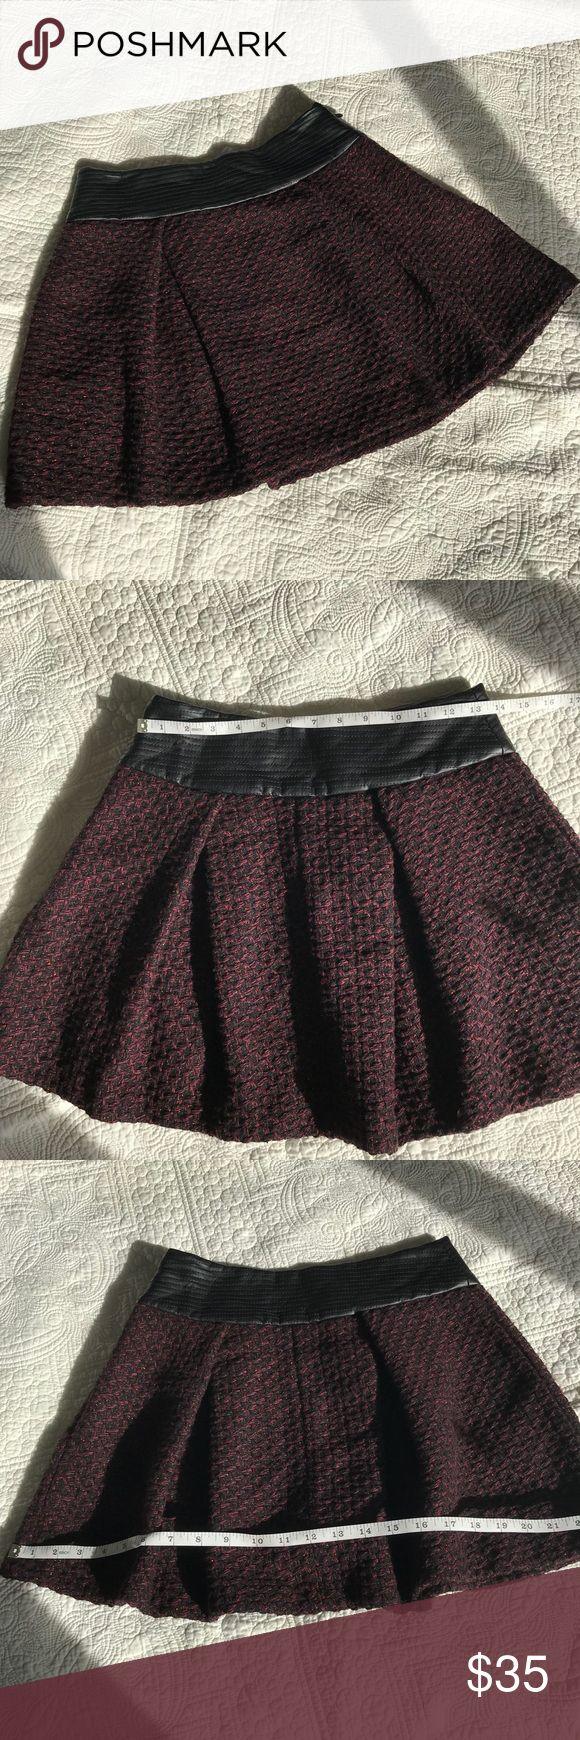 BCBG generations skirt. Maroon,black with gold flecks mini skirt with leather type waist. BCBGeneration Skirts Mini